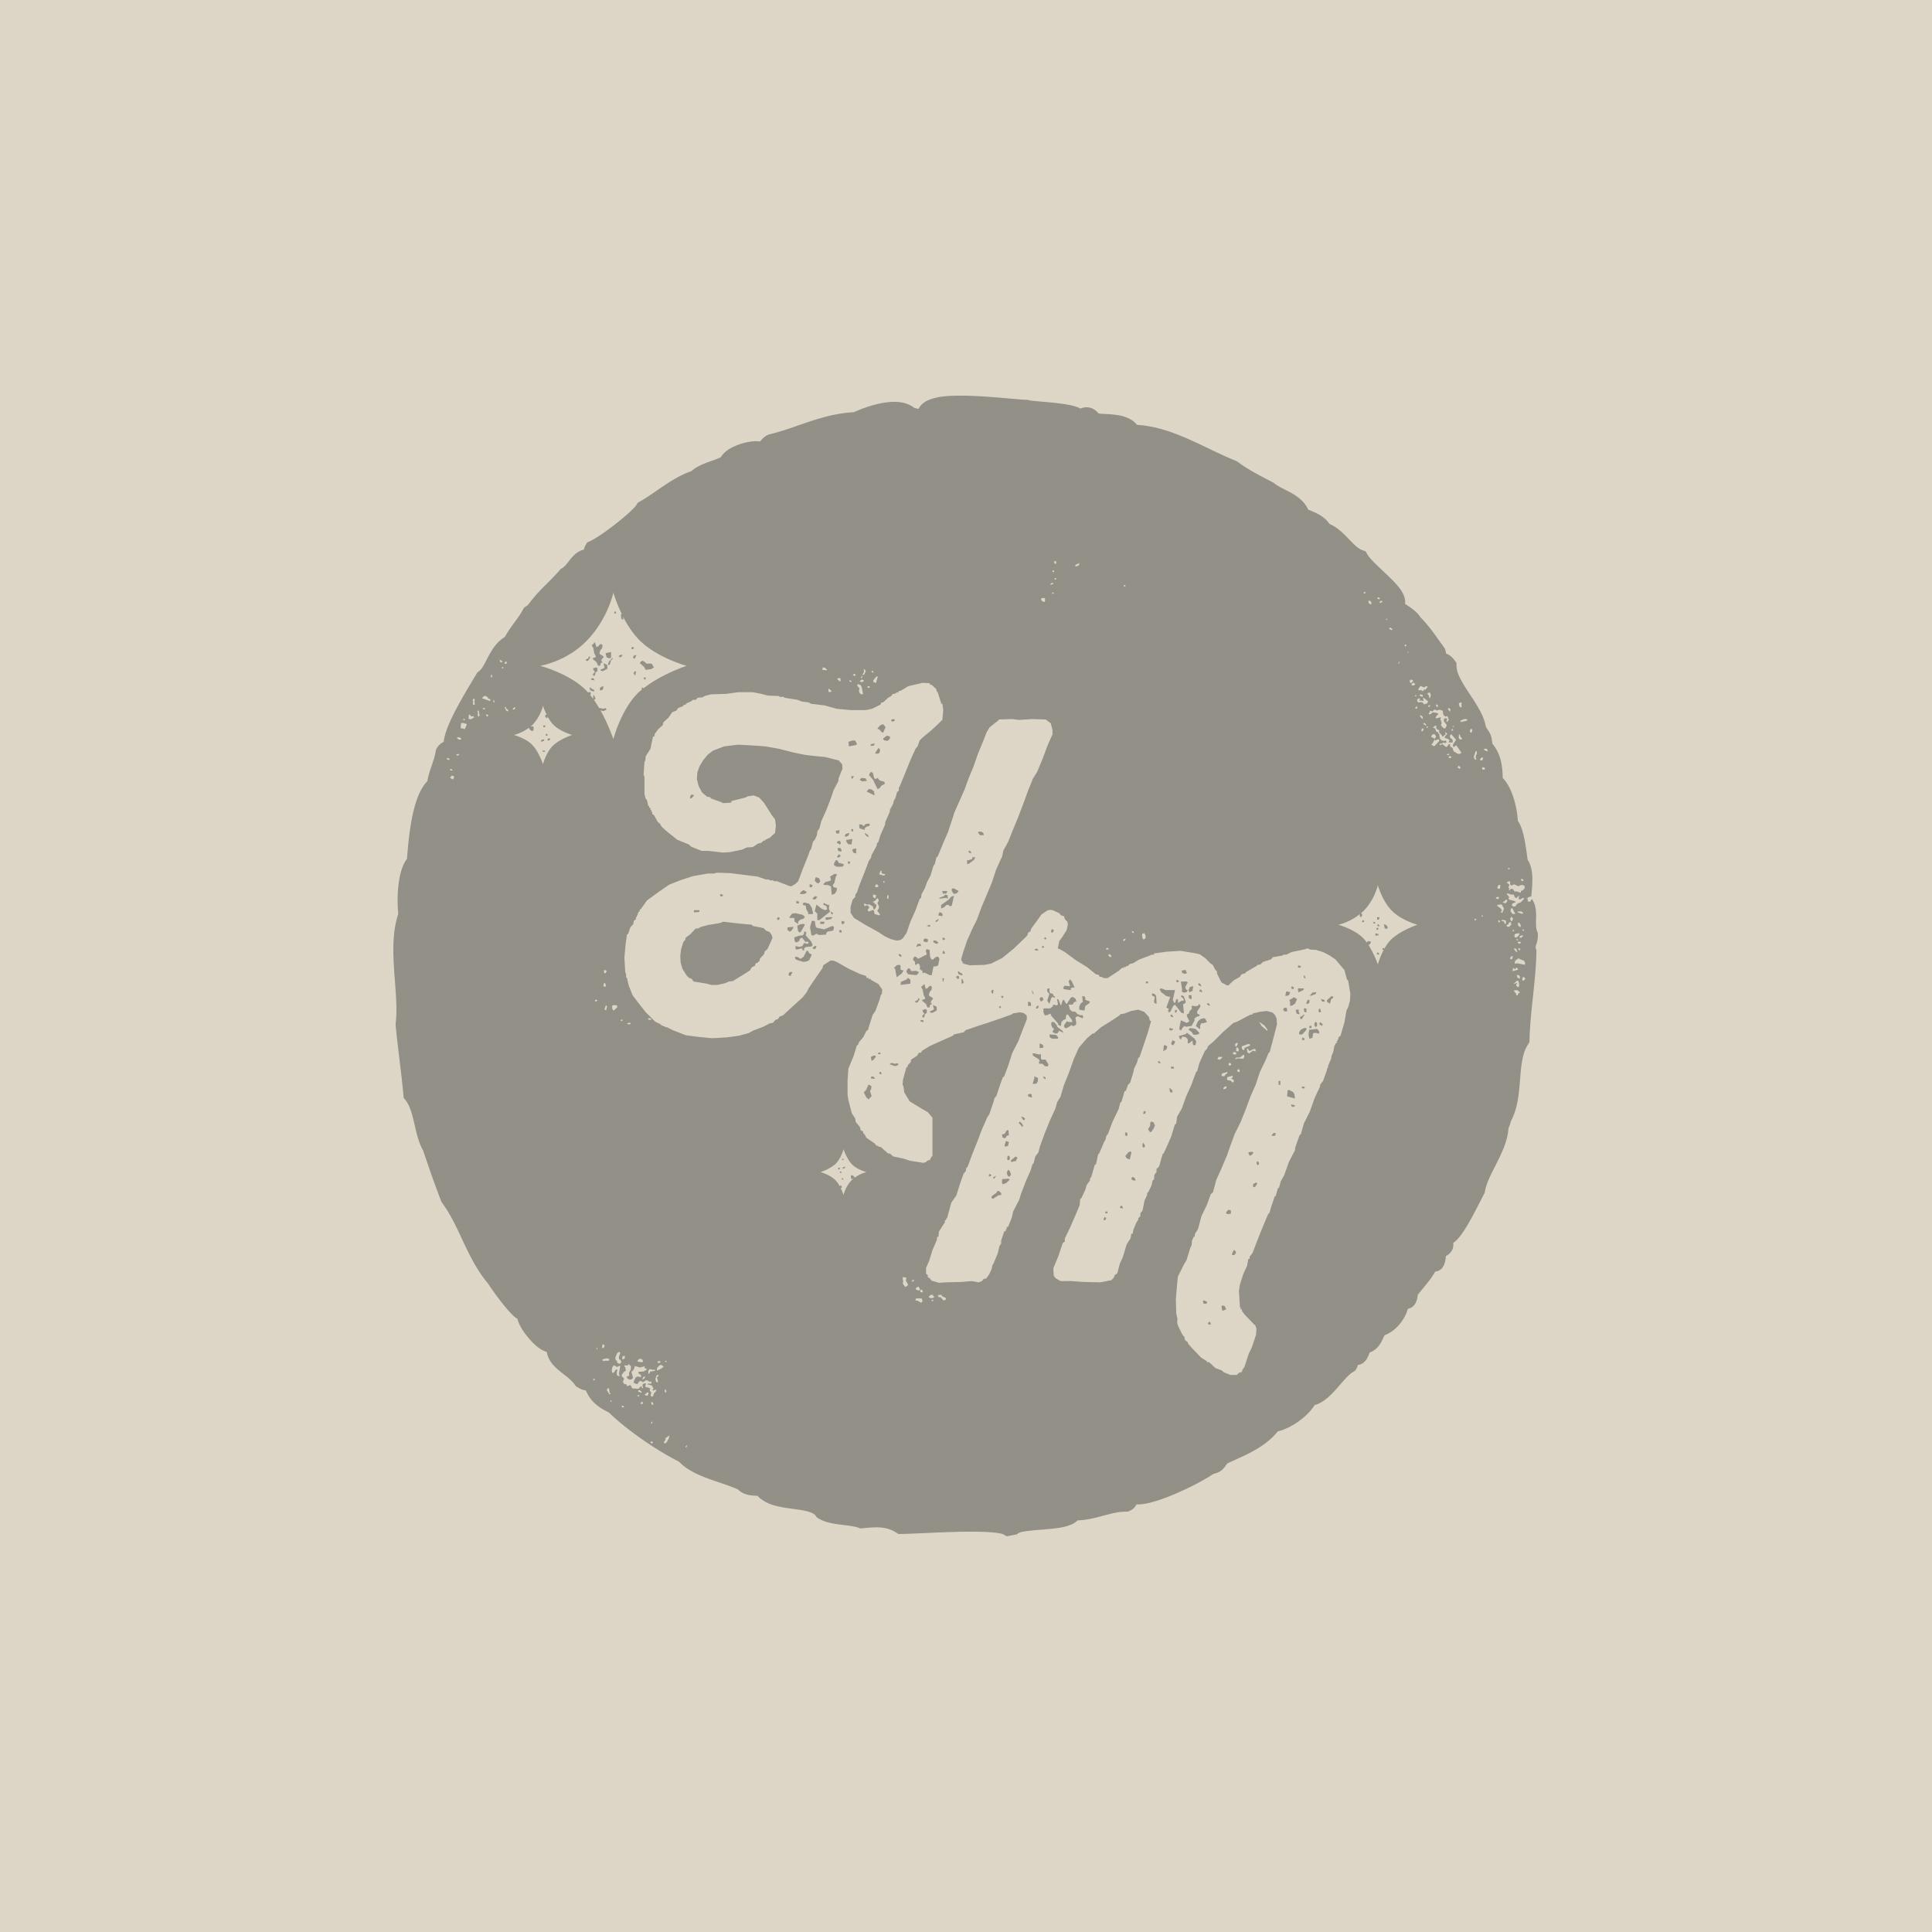 logos_0036_hm_5.jpg